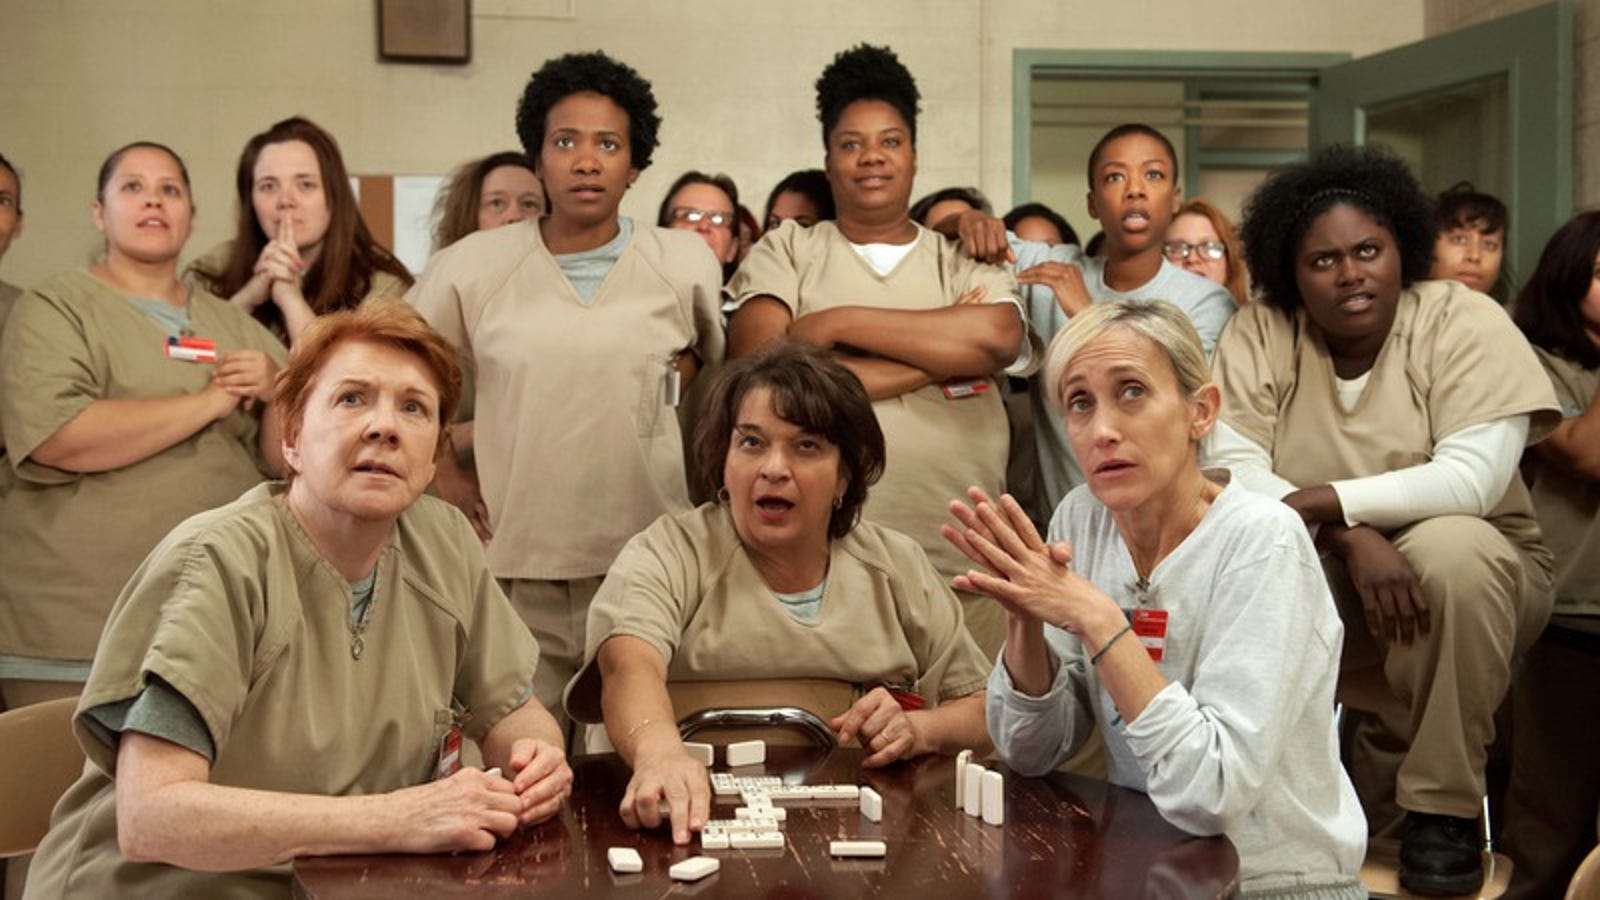 Orange is the New Black Garners 12 Emmy Nods, Laverne Cox Makes History